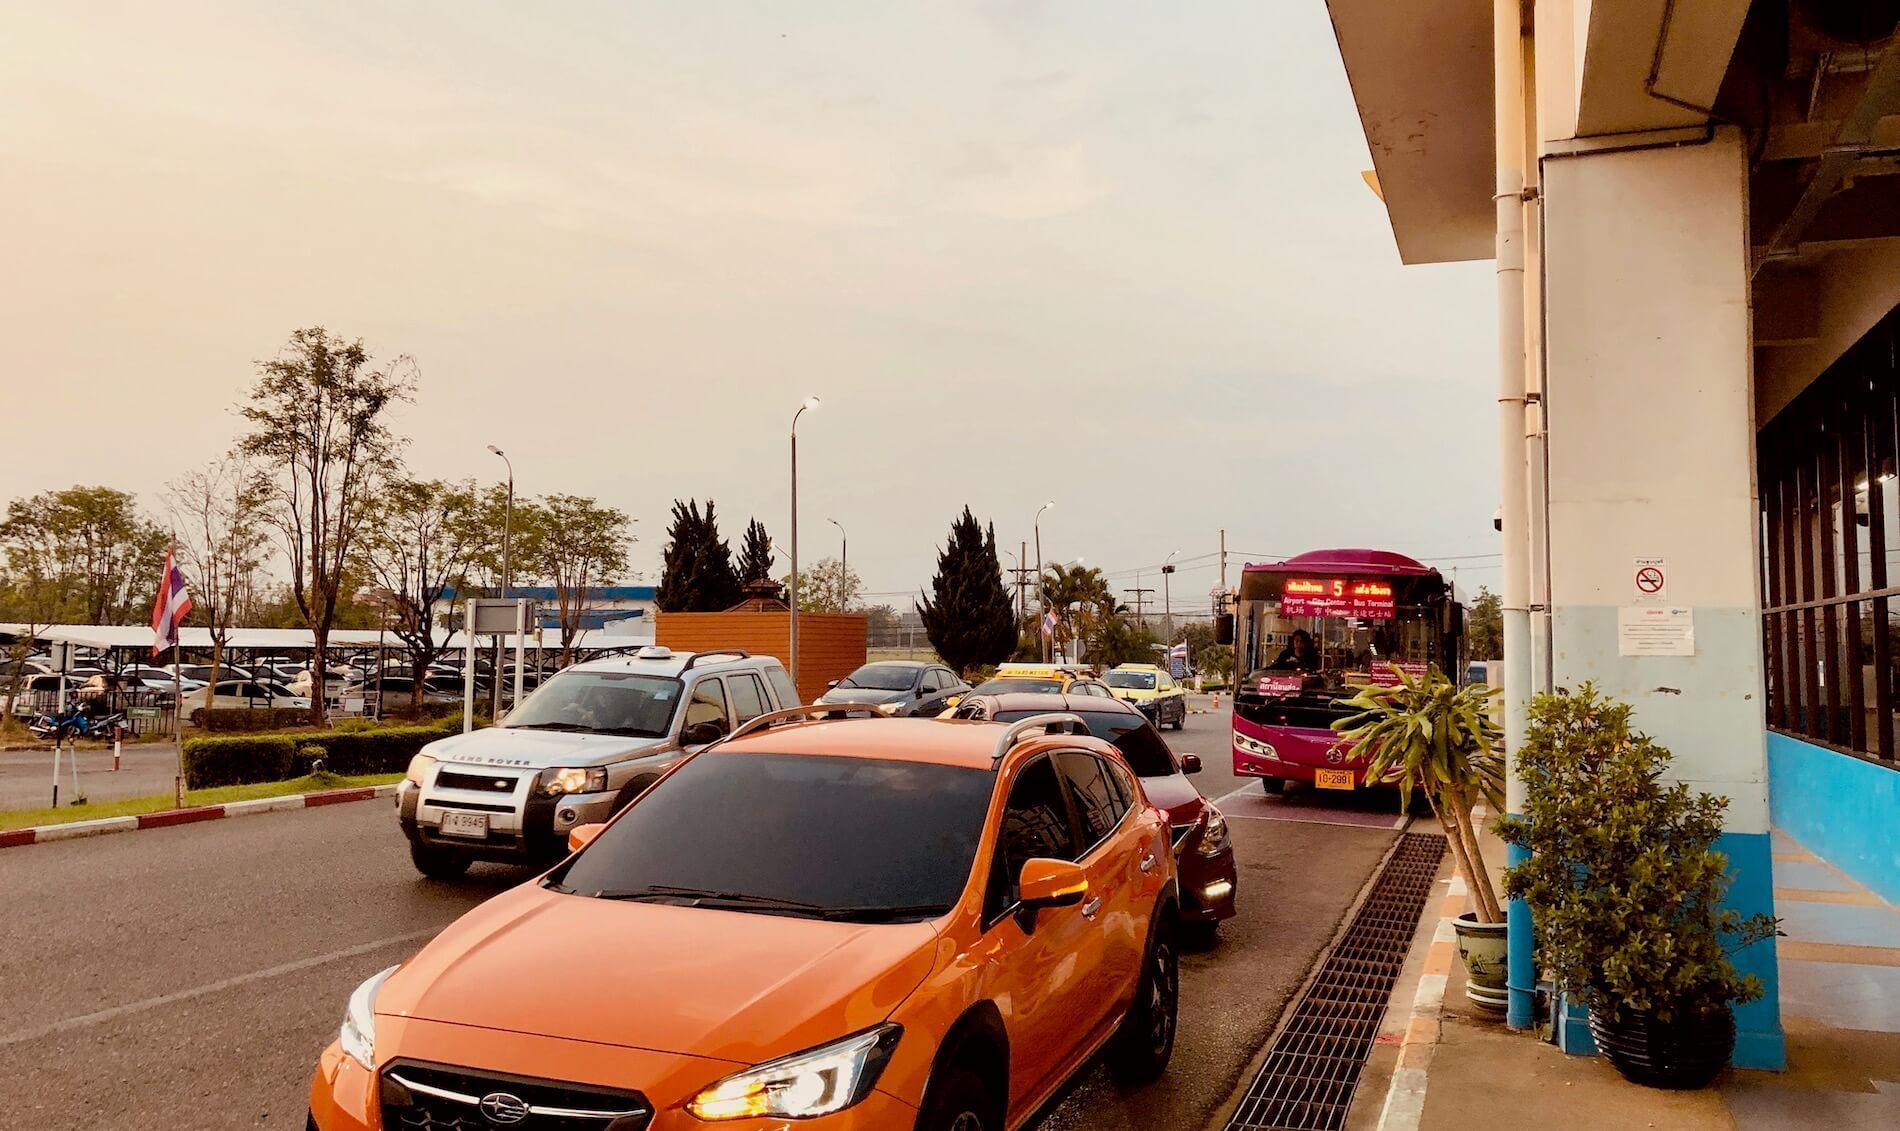 Abfahrtsort des Chiang Rai Airport Bus am Flughafen